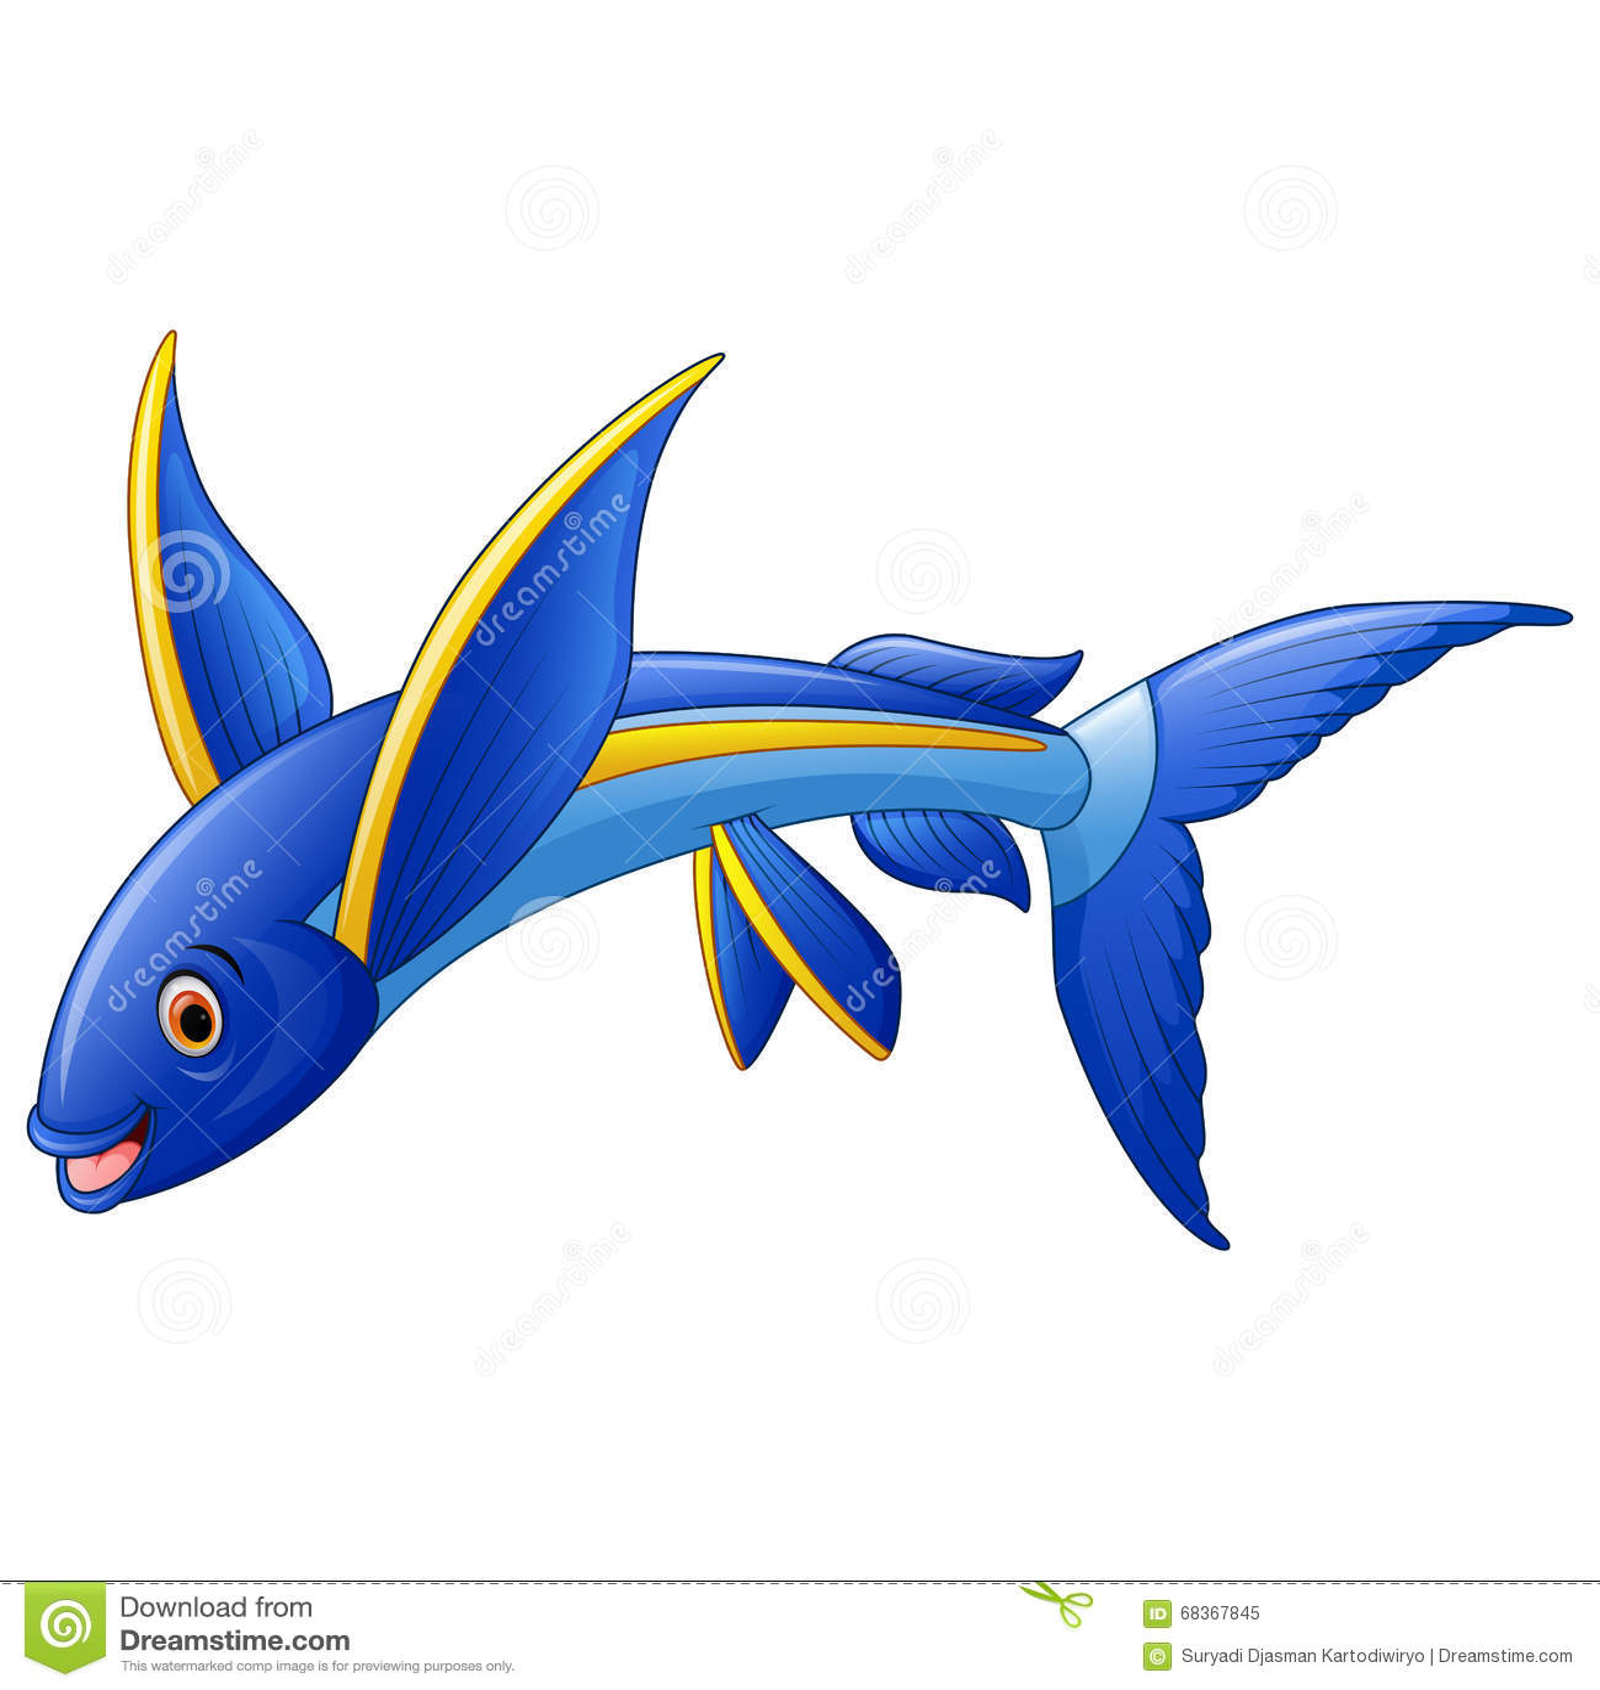 Flying Fish Cartoon Character Stock Illustration - Image: 68367845